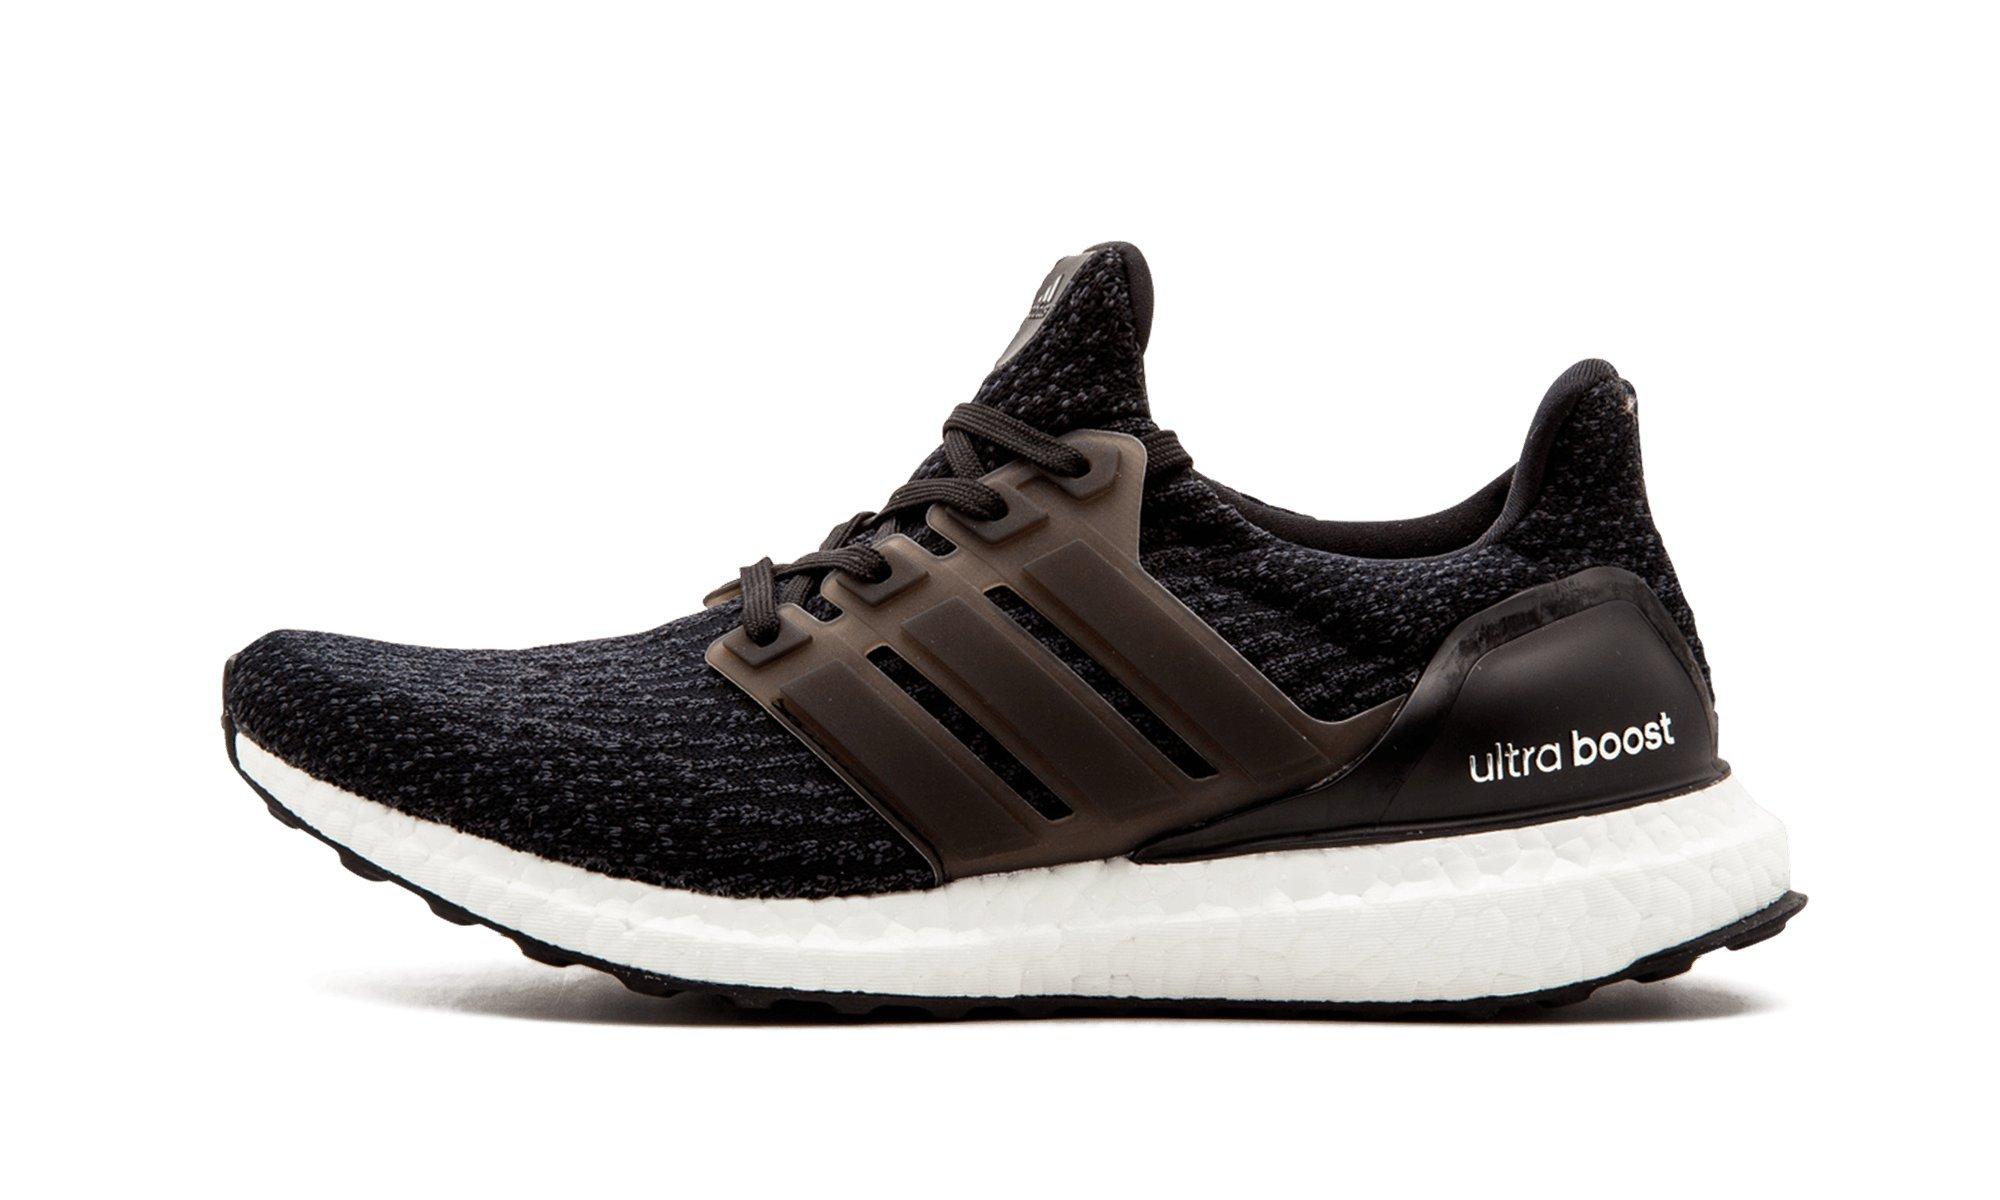 fdca41a8800 Galleon - Adidas Women s Ultraboost W Running Shoe